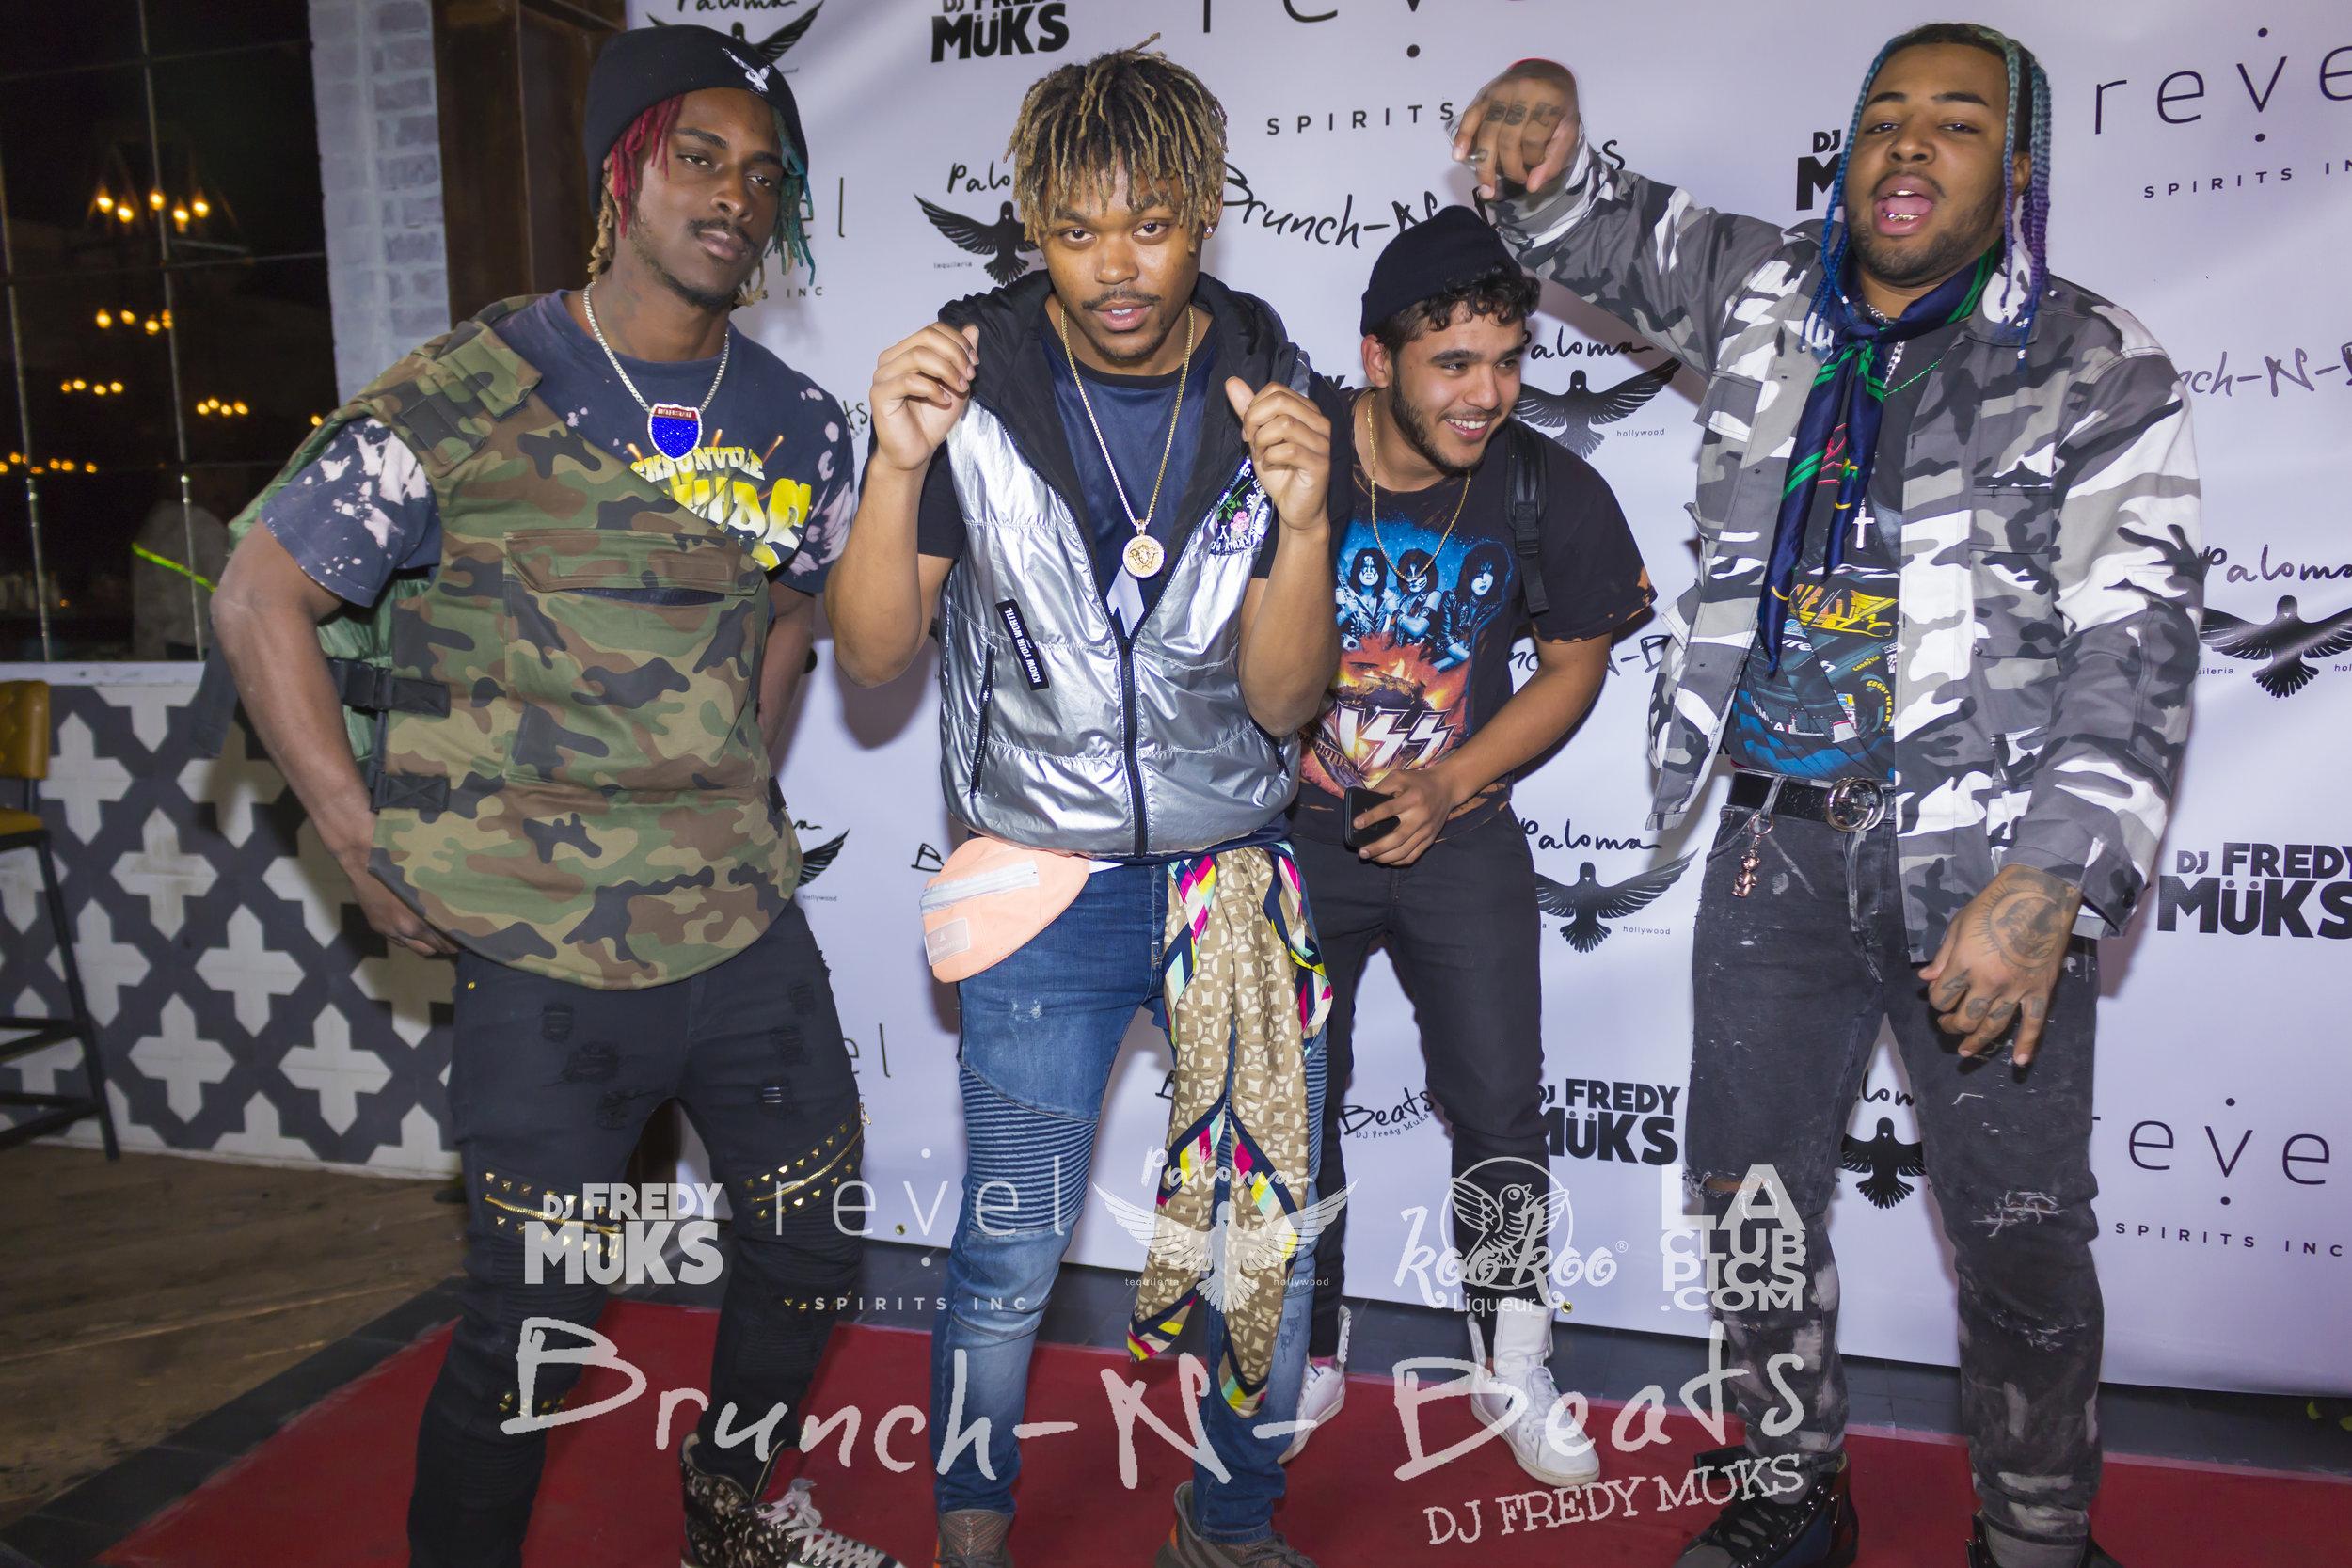 Brunch-N-Beats - Paloma Hollywood - 02-25-18_218.jpg